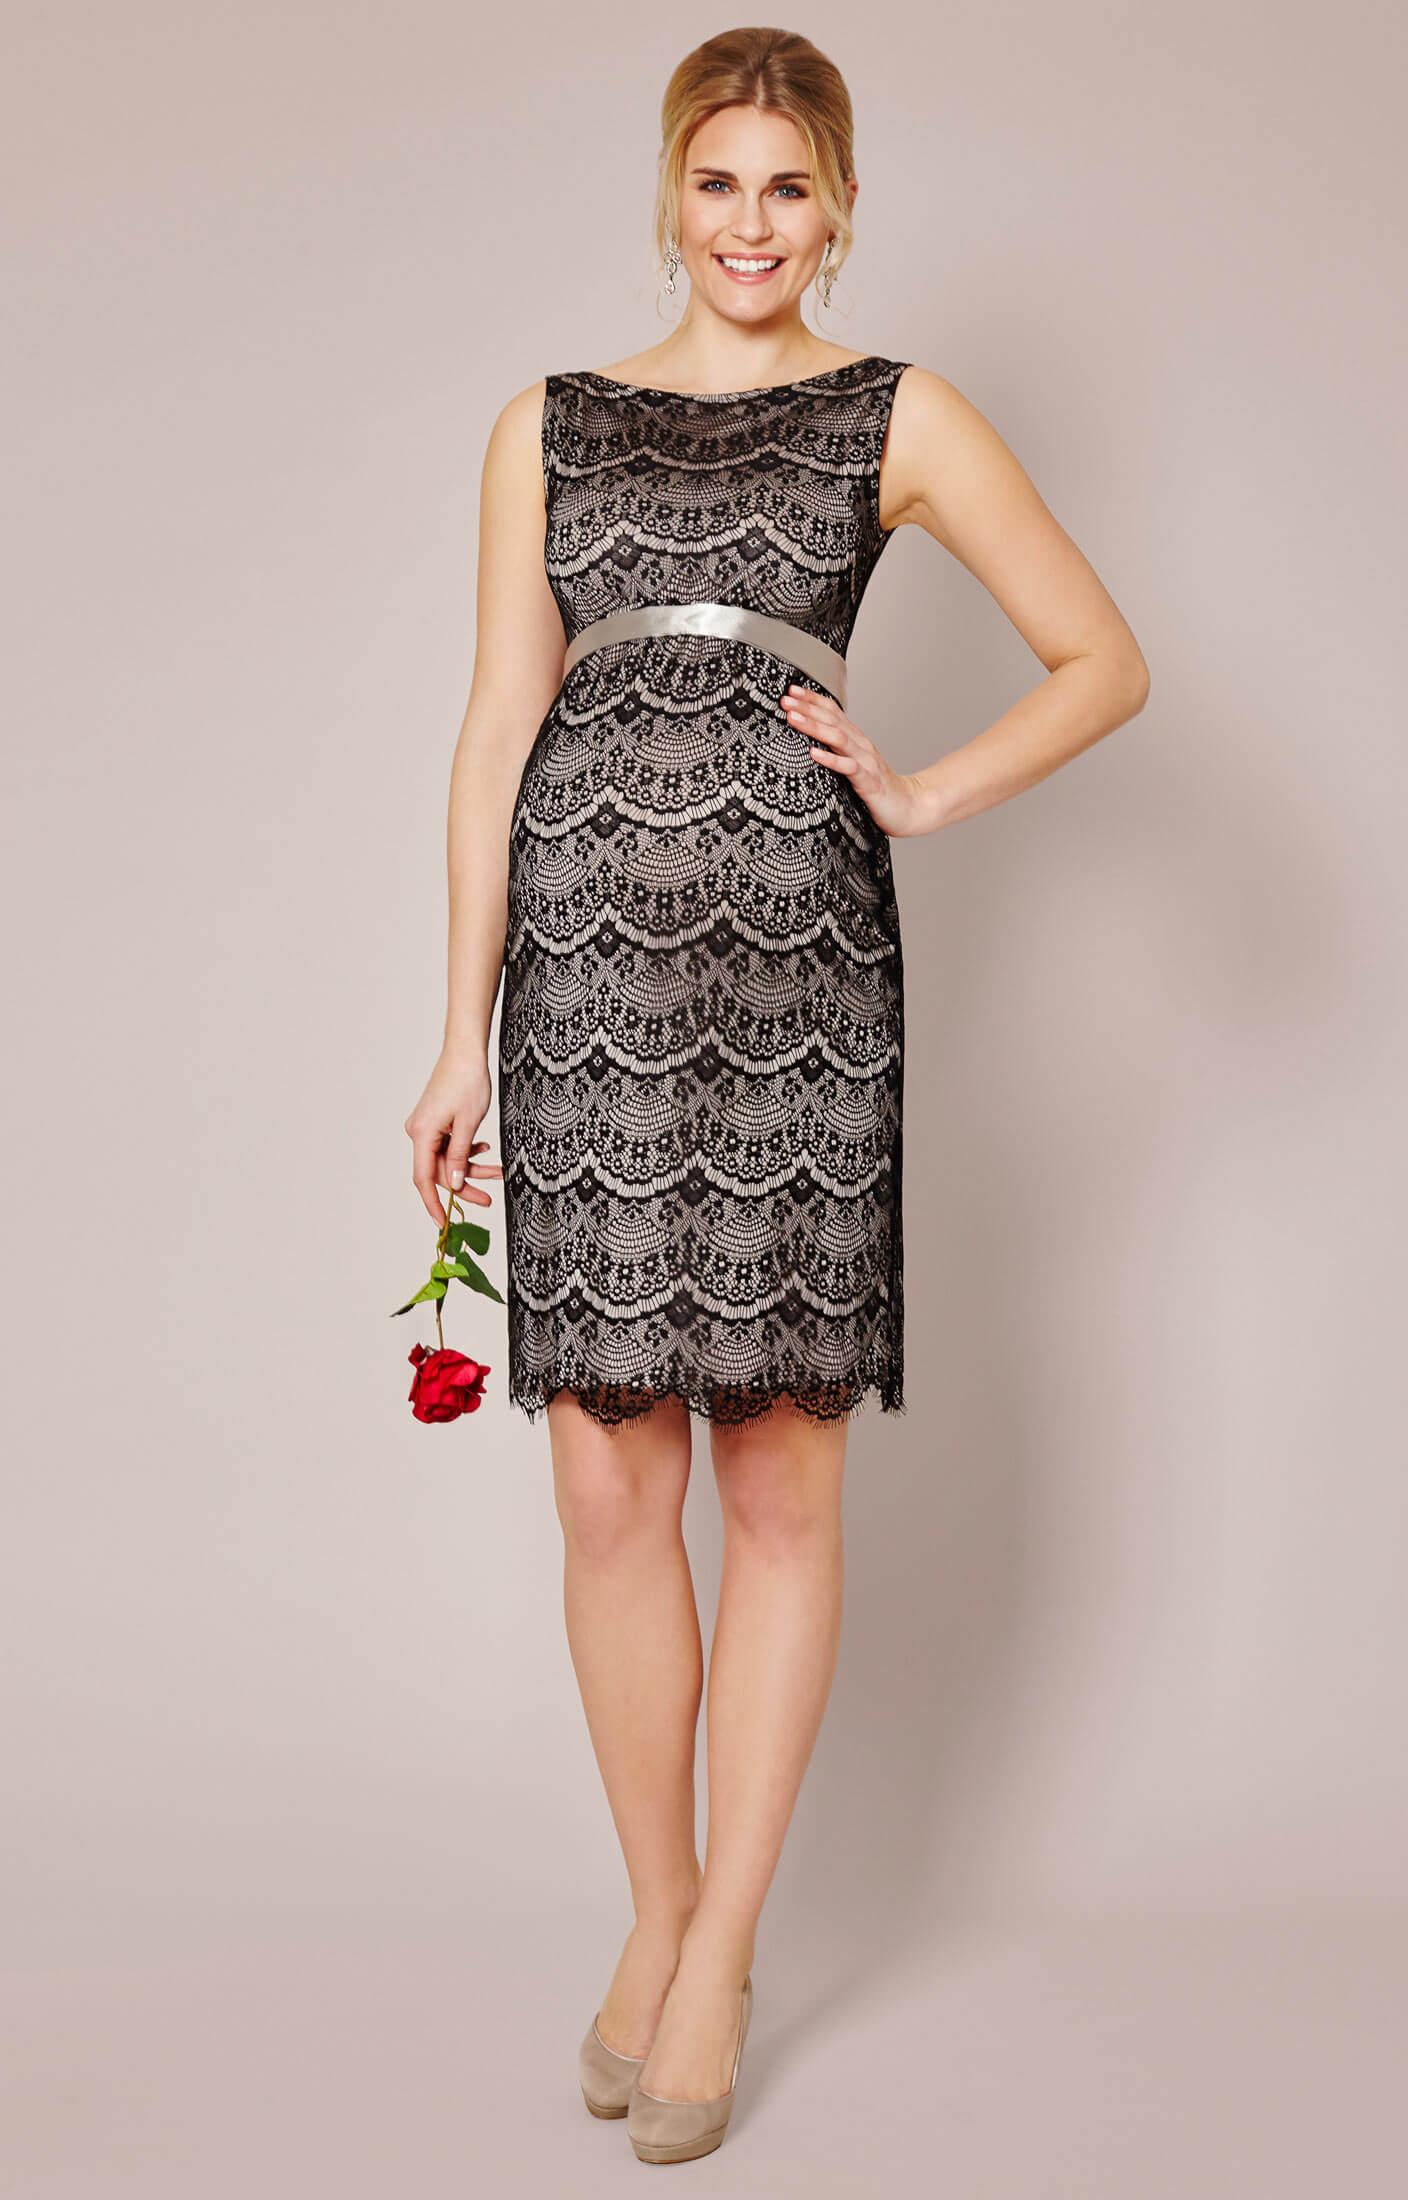 Audrey Shift Maternity Dress (Black) maternity dresses for wedding Audrey Shift Maternity Dress Black by Tiffany Rose